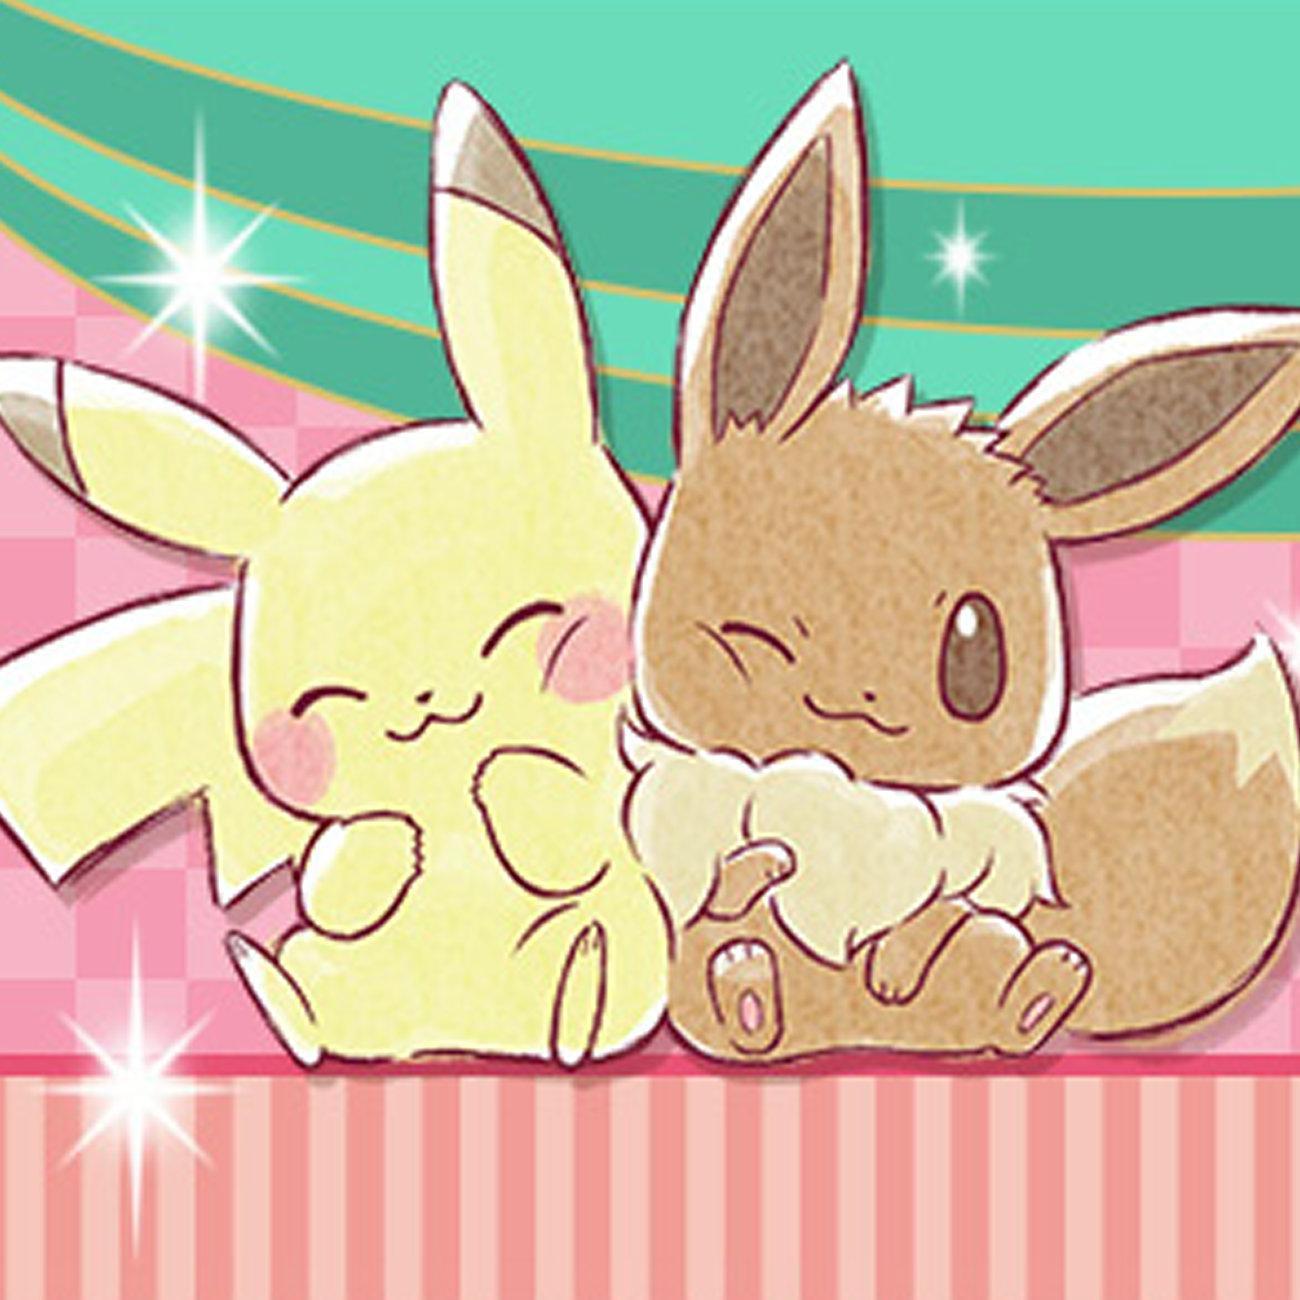 Pokemon Collectionくじ 2018 ピカチュウ&イーブイ